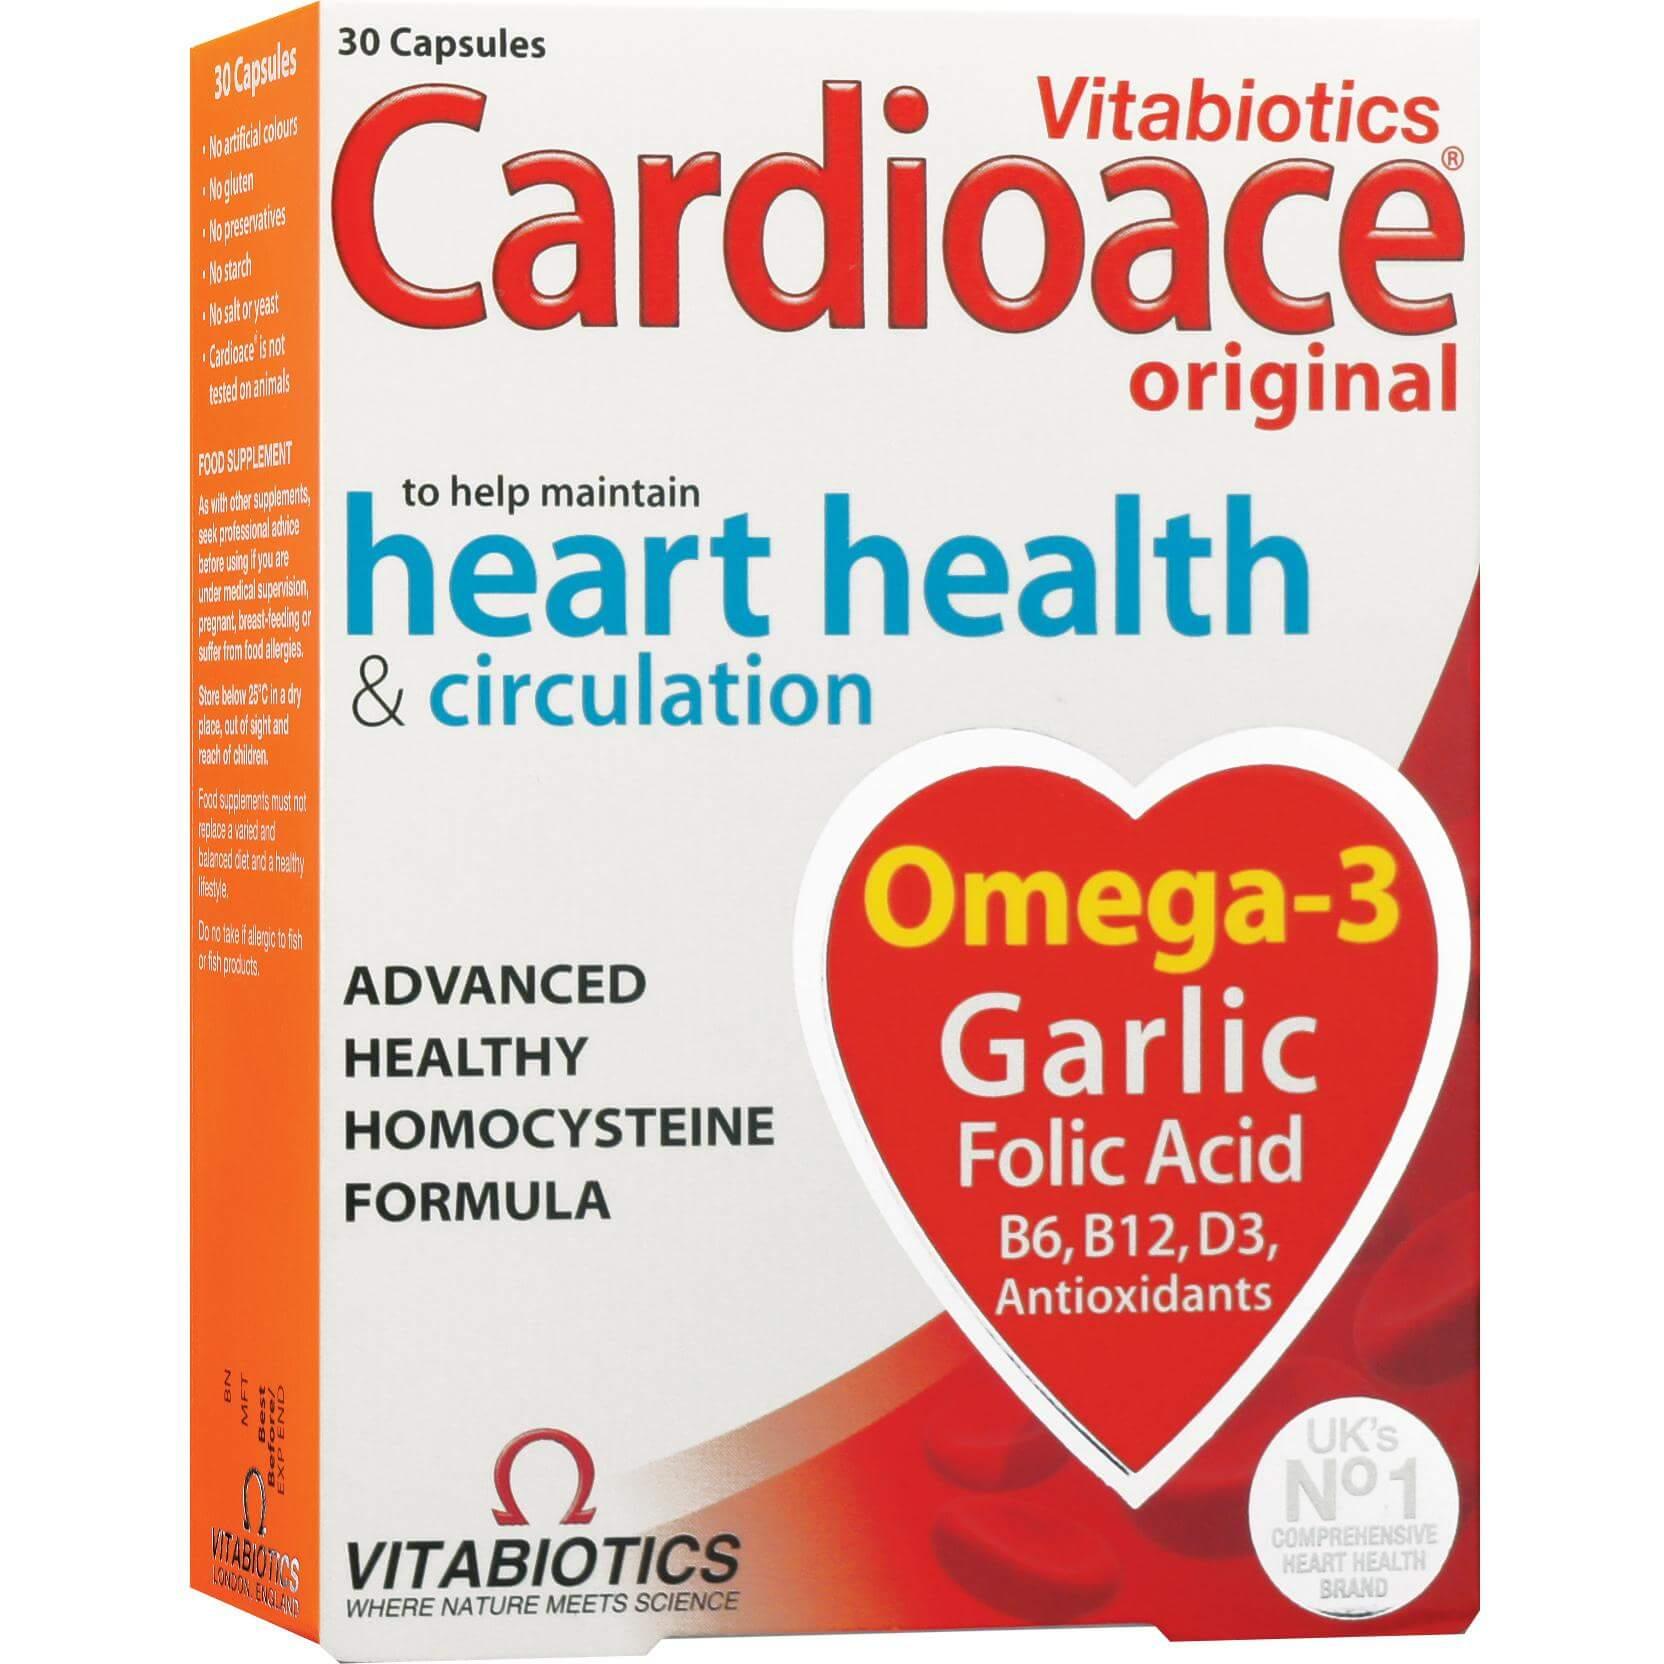 Vitabiotics Cardioace Συμπλήρωμα Διατροφής για την Υγεία της Καρδιάς 30caps